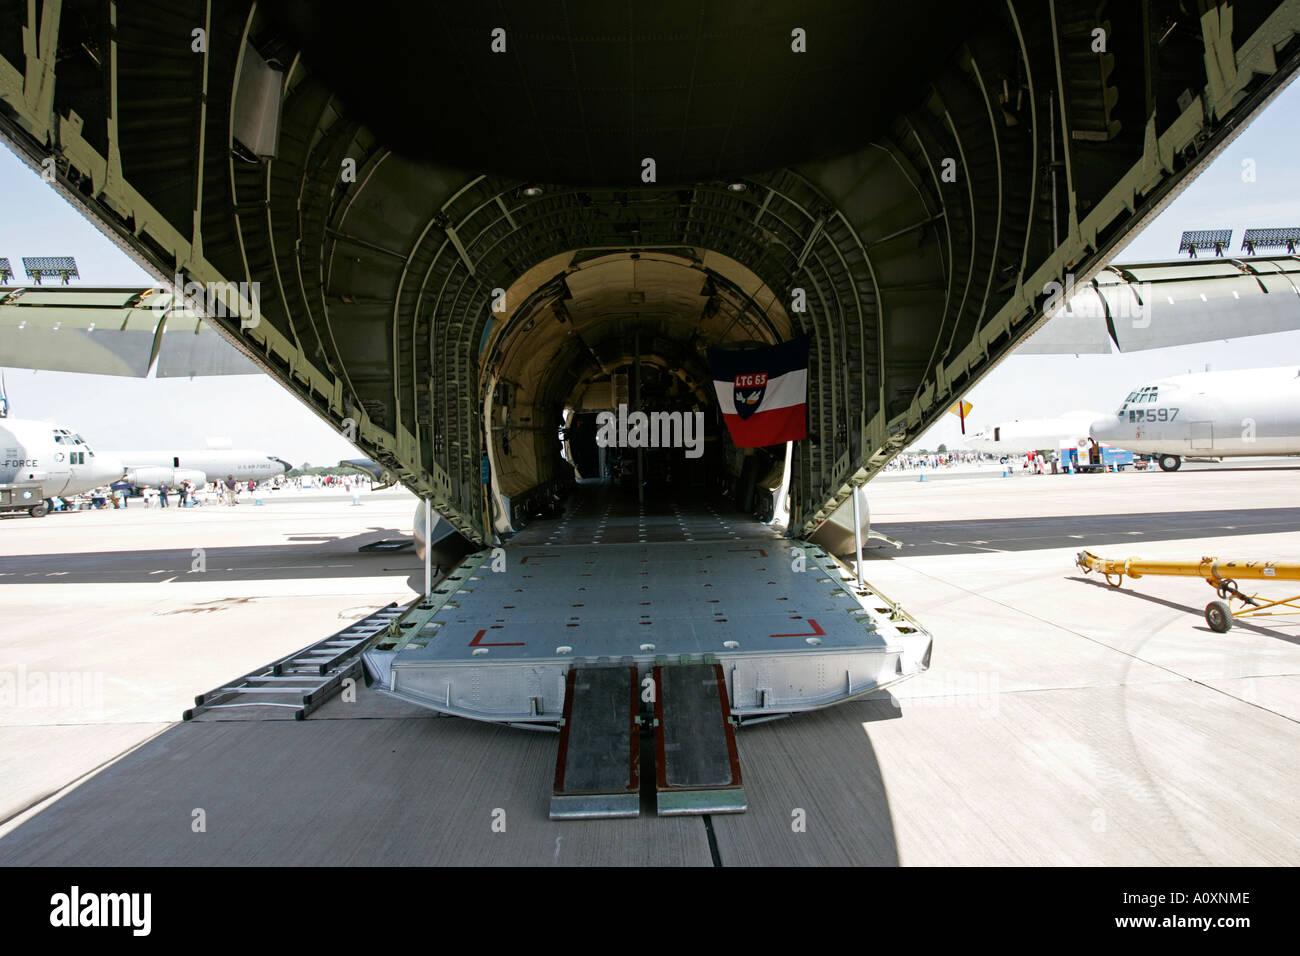 Rear cargo ramp of German Air Force Luftwaffe C 130 Hercules aircraft RIAT 2005 RAF Fairford Gloucestershire England UK - Stock Image